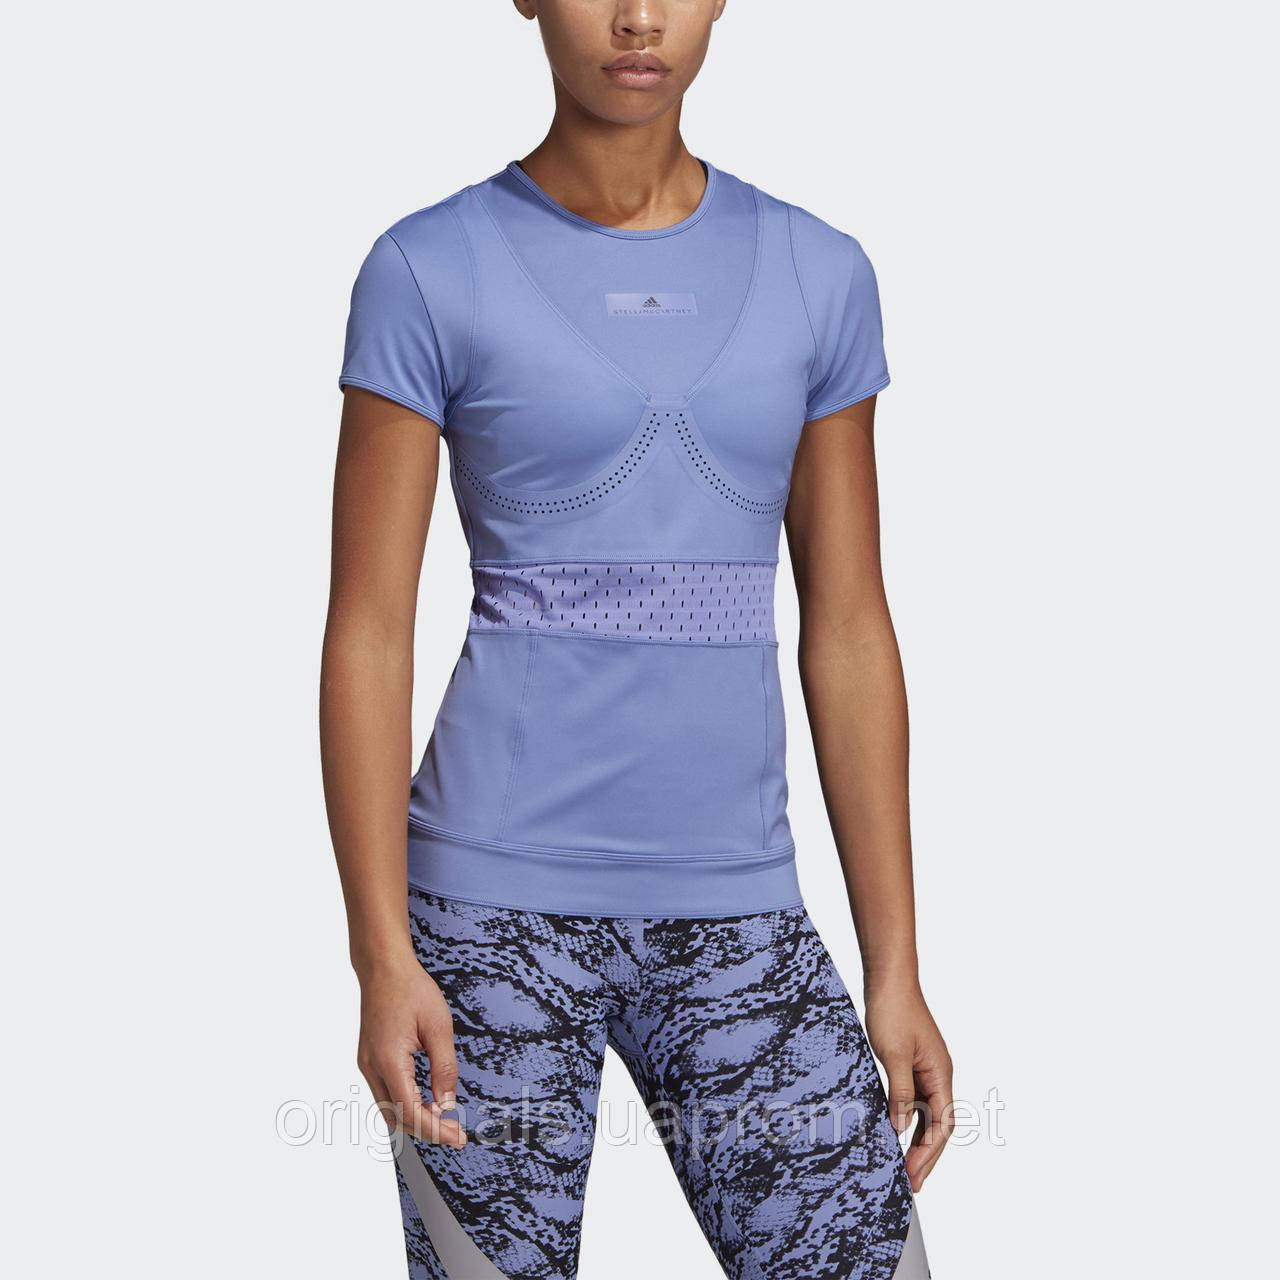 6c391496985 Спортивная футболка adidas by Stella McCartney Train Tee DT9258 - 2019 -  интернет-магазин Originals